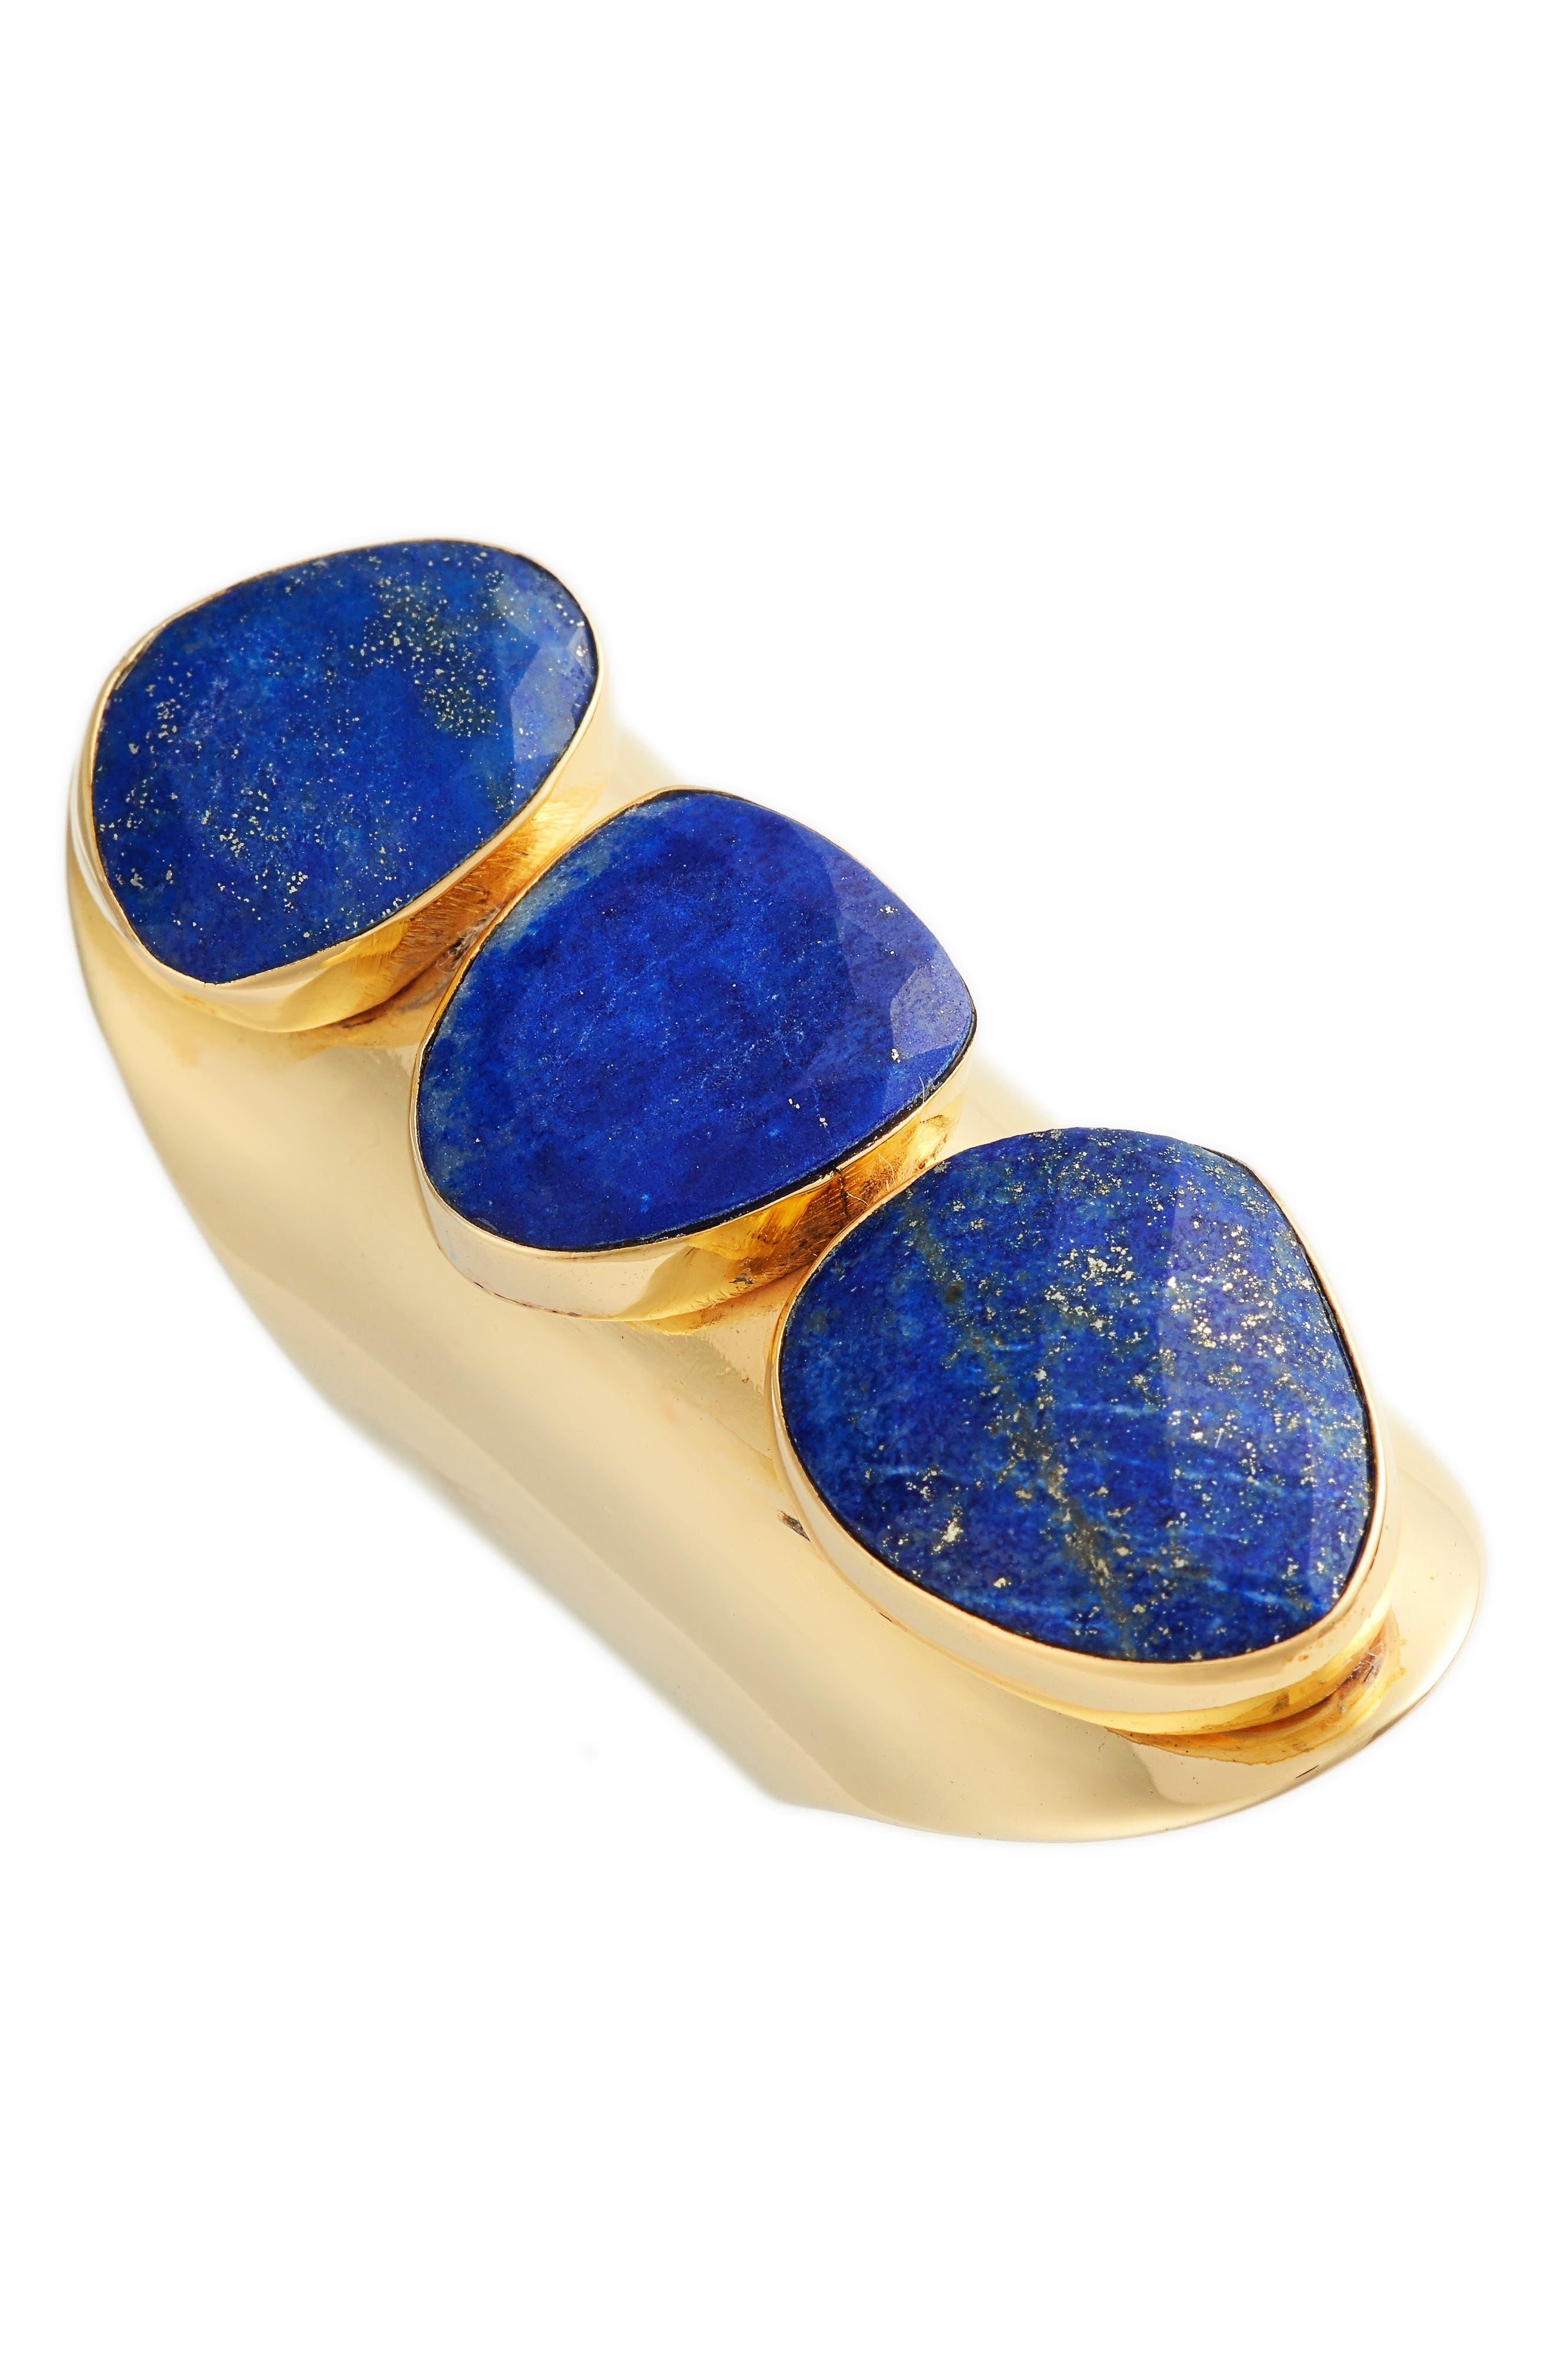 Anas 3 Stone Lapis Ring,                             Main thumbnail 1, color,